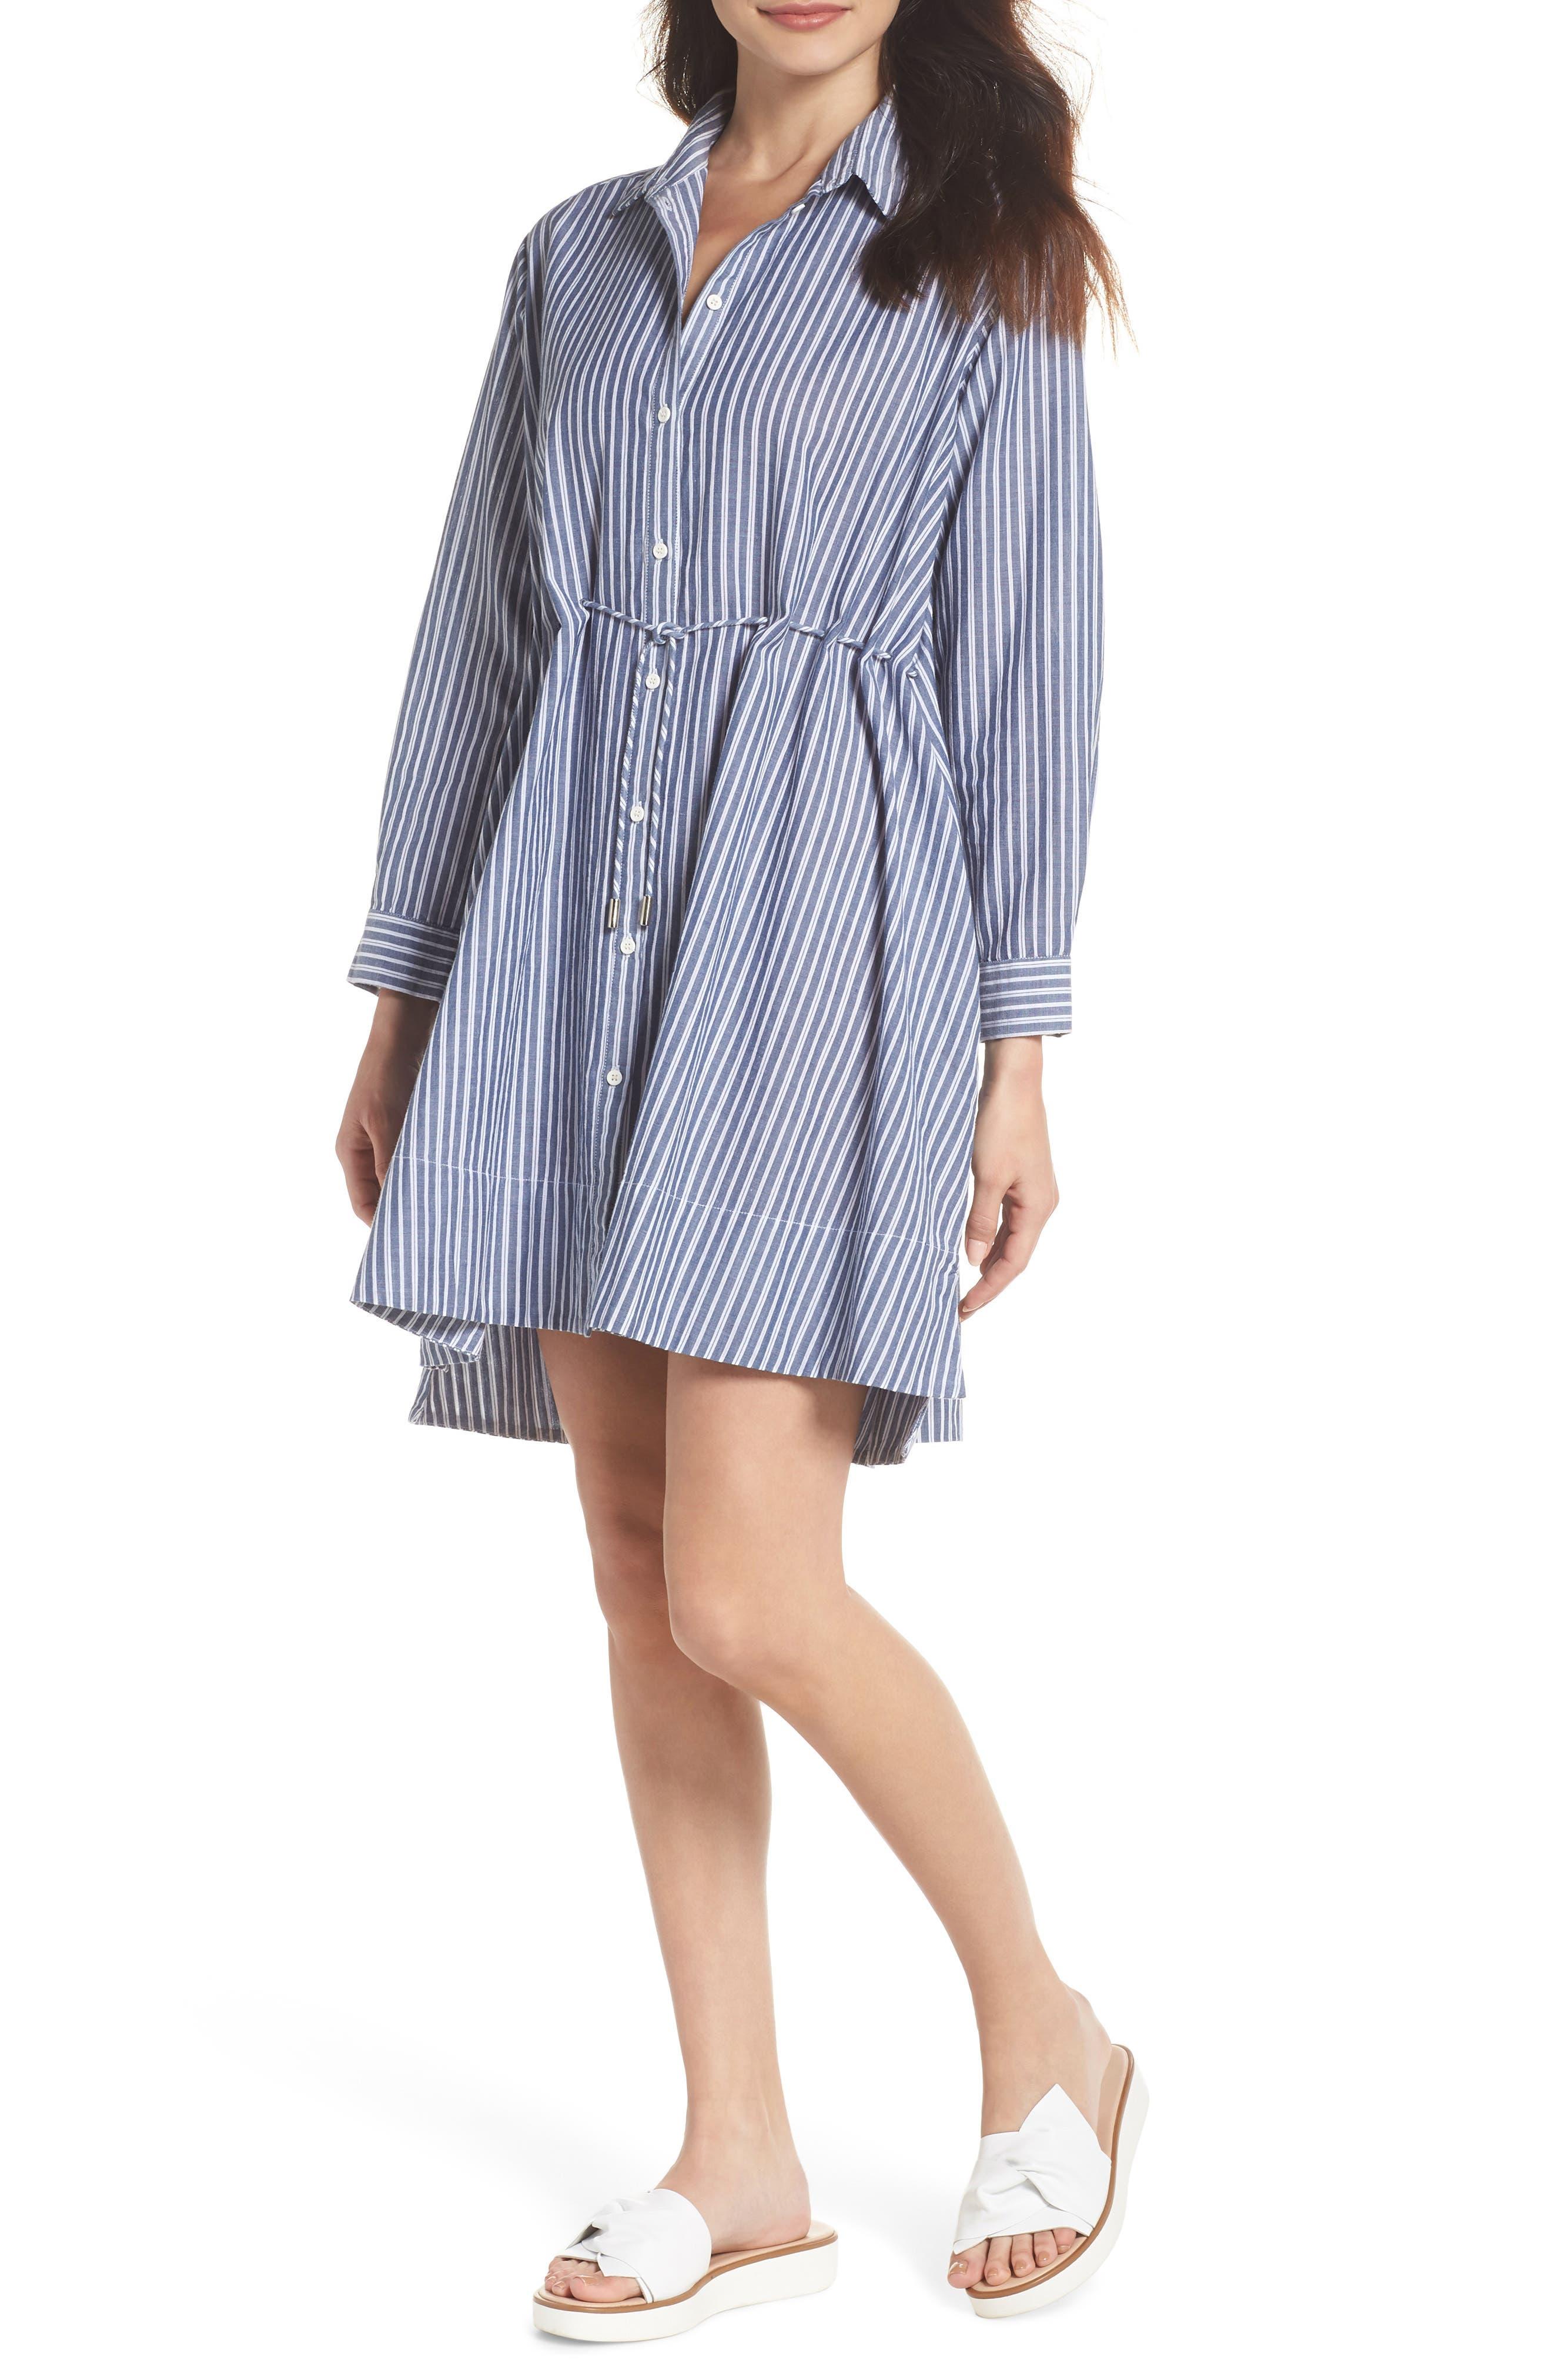 Tatus Stripe Drawstring Cotton Shirtdress,                             Main thumbnail 1, color,                             452